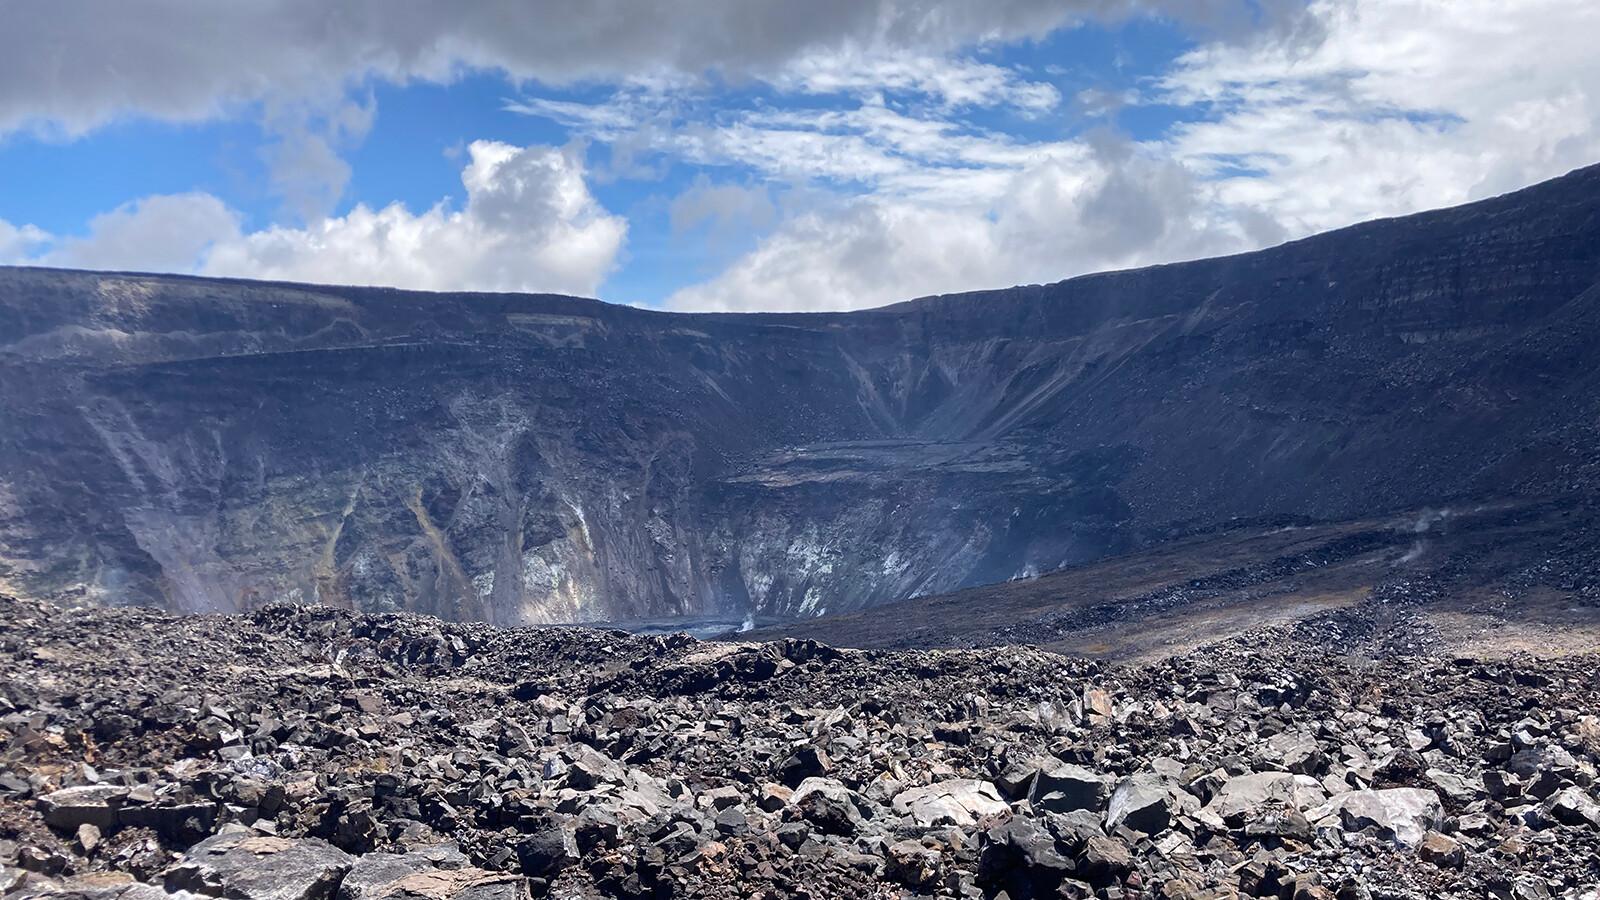 Kilauea volcano alert raised as a swarm of small earthquakes hits the region